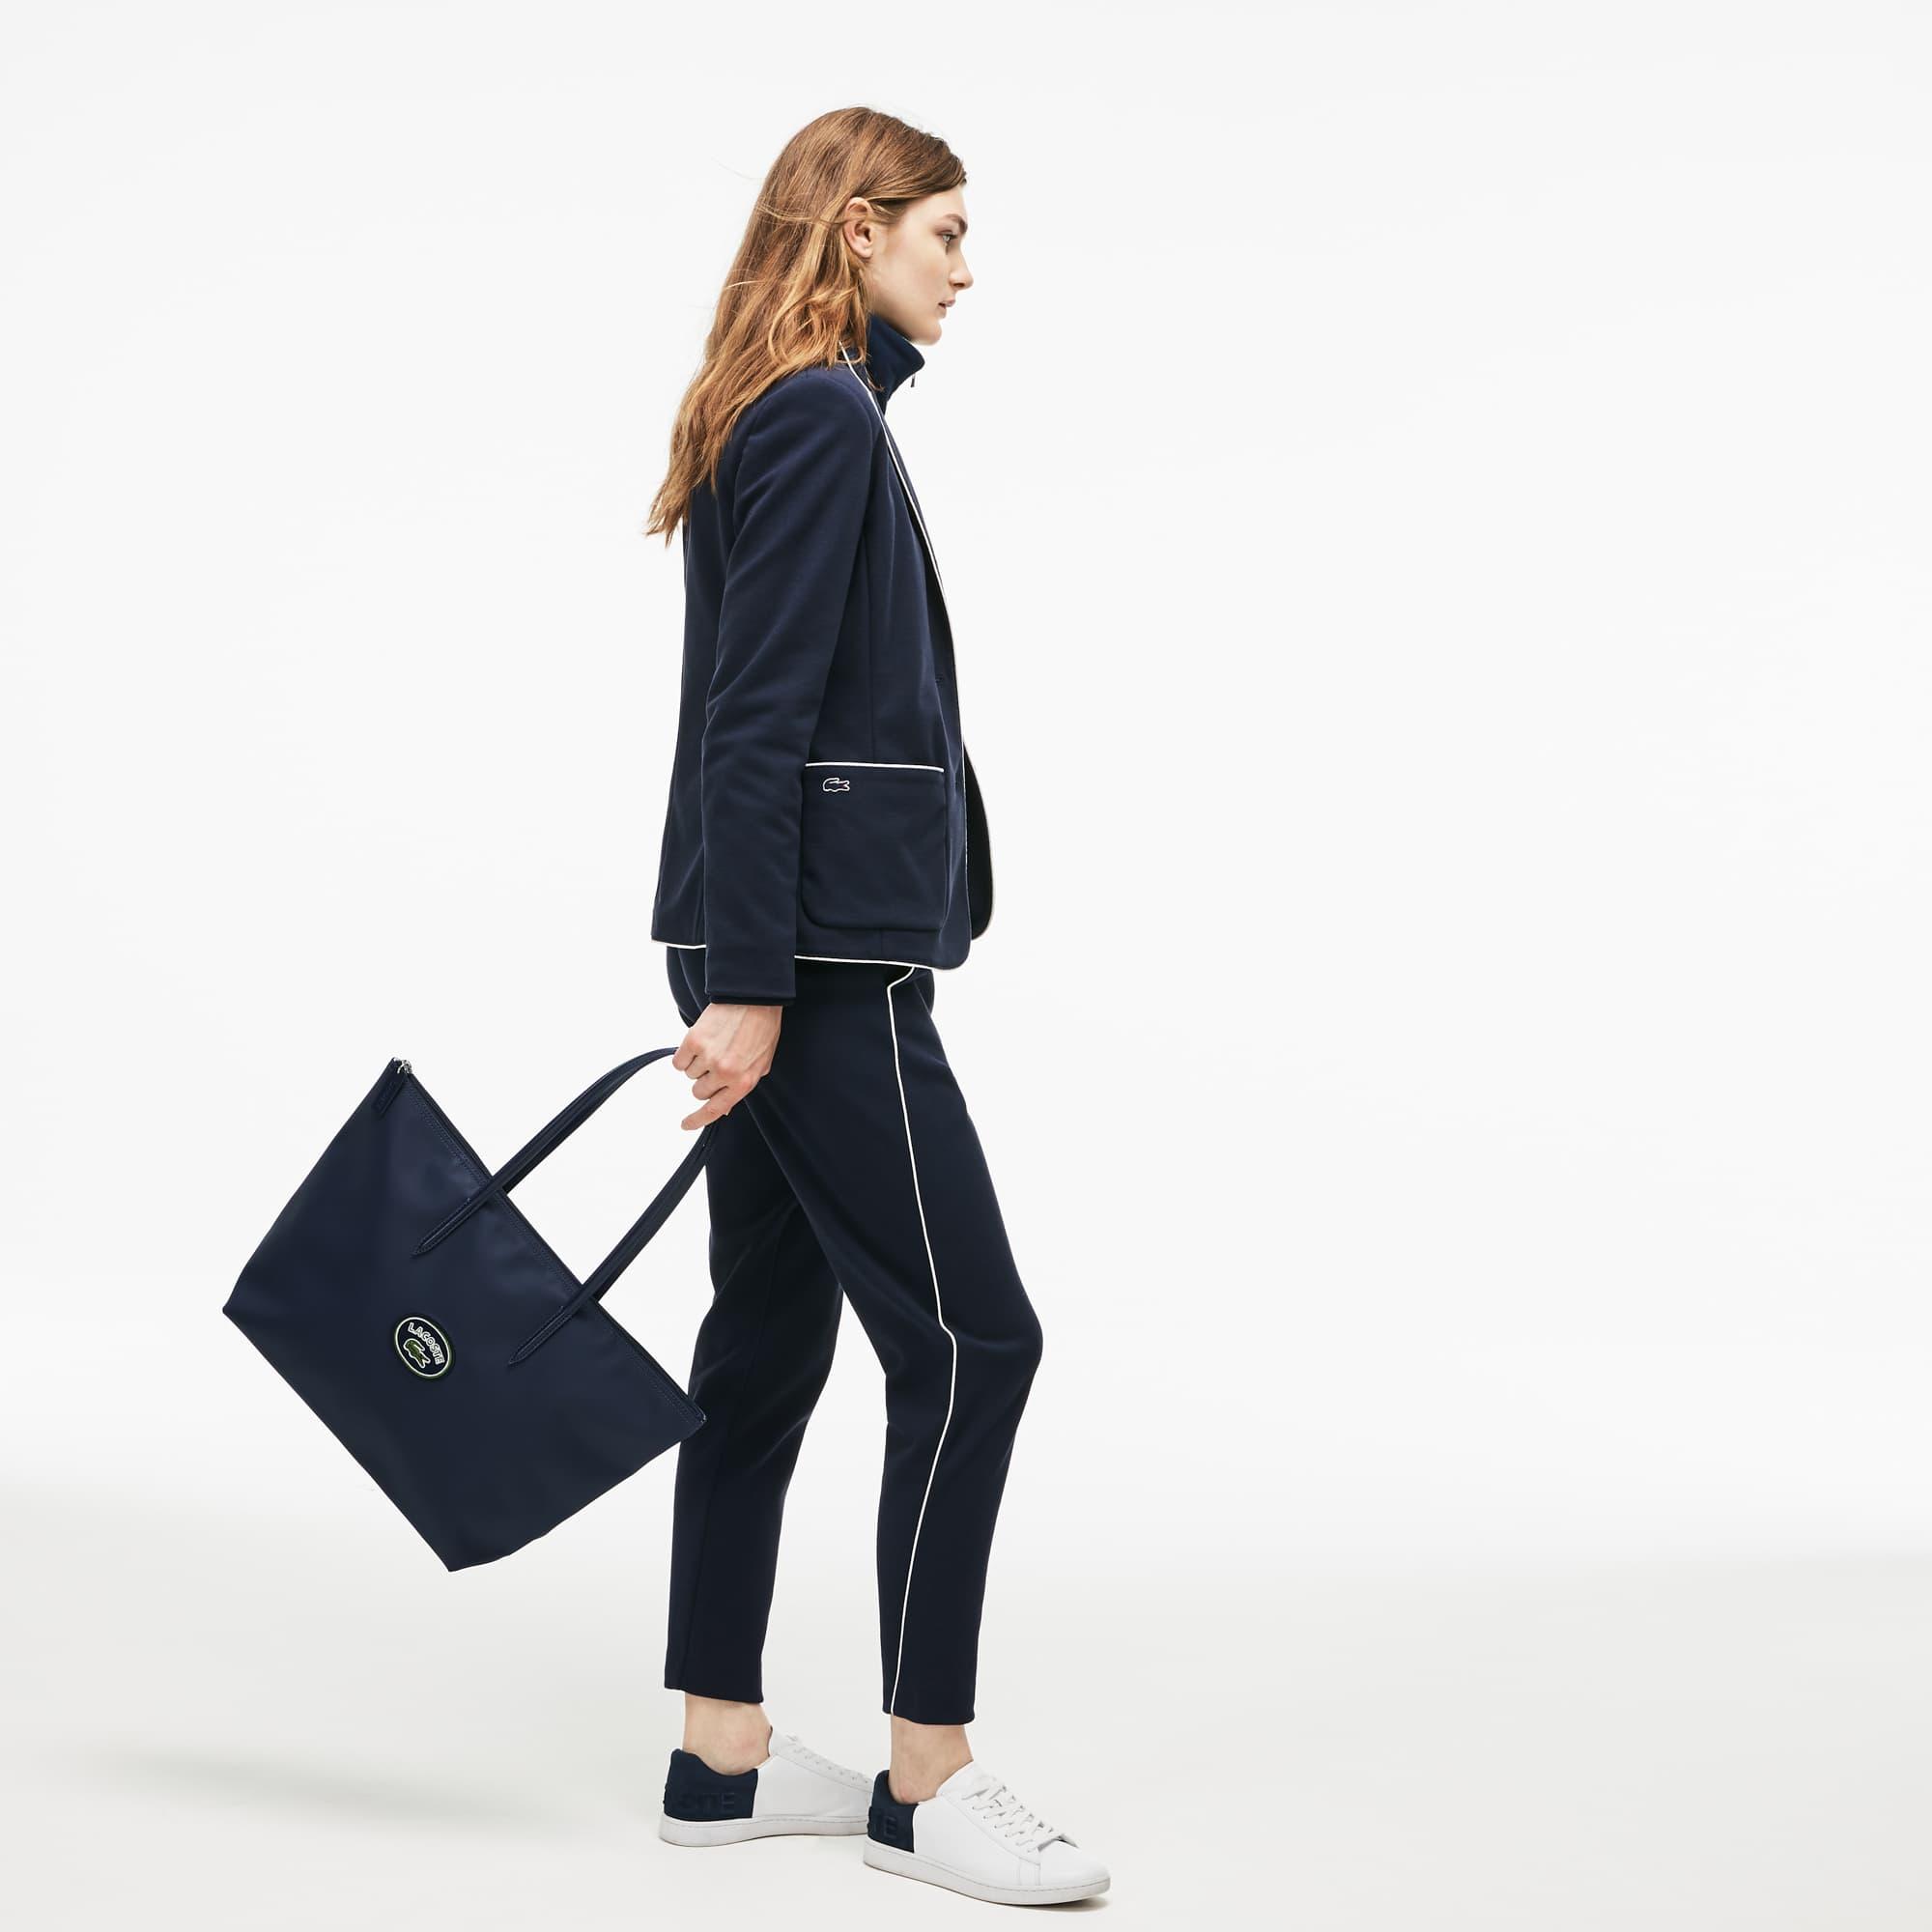 L.12.12 Concept-shopper dames groot met Lacoste-badge